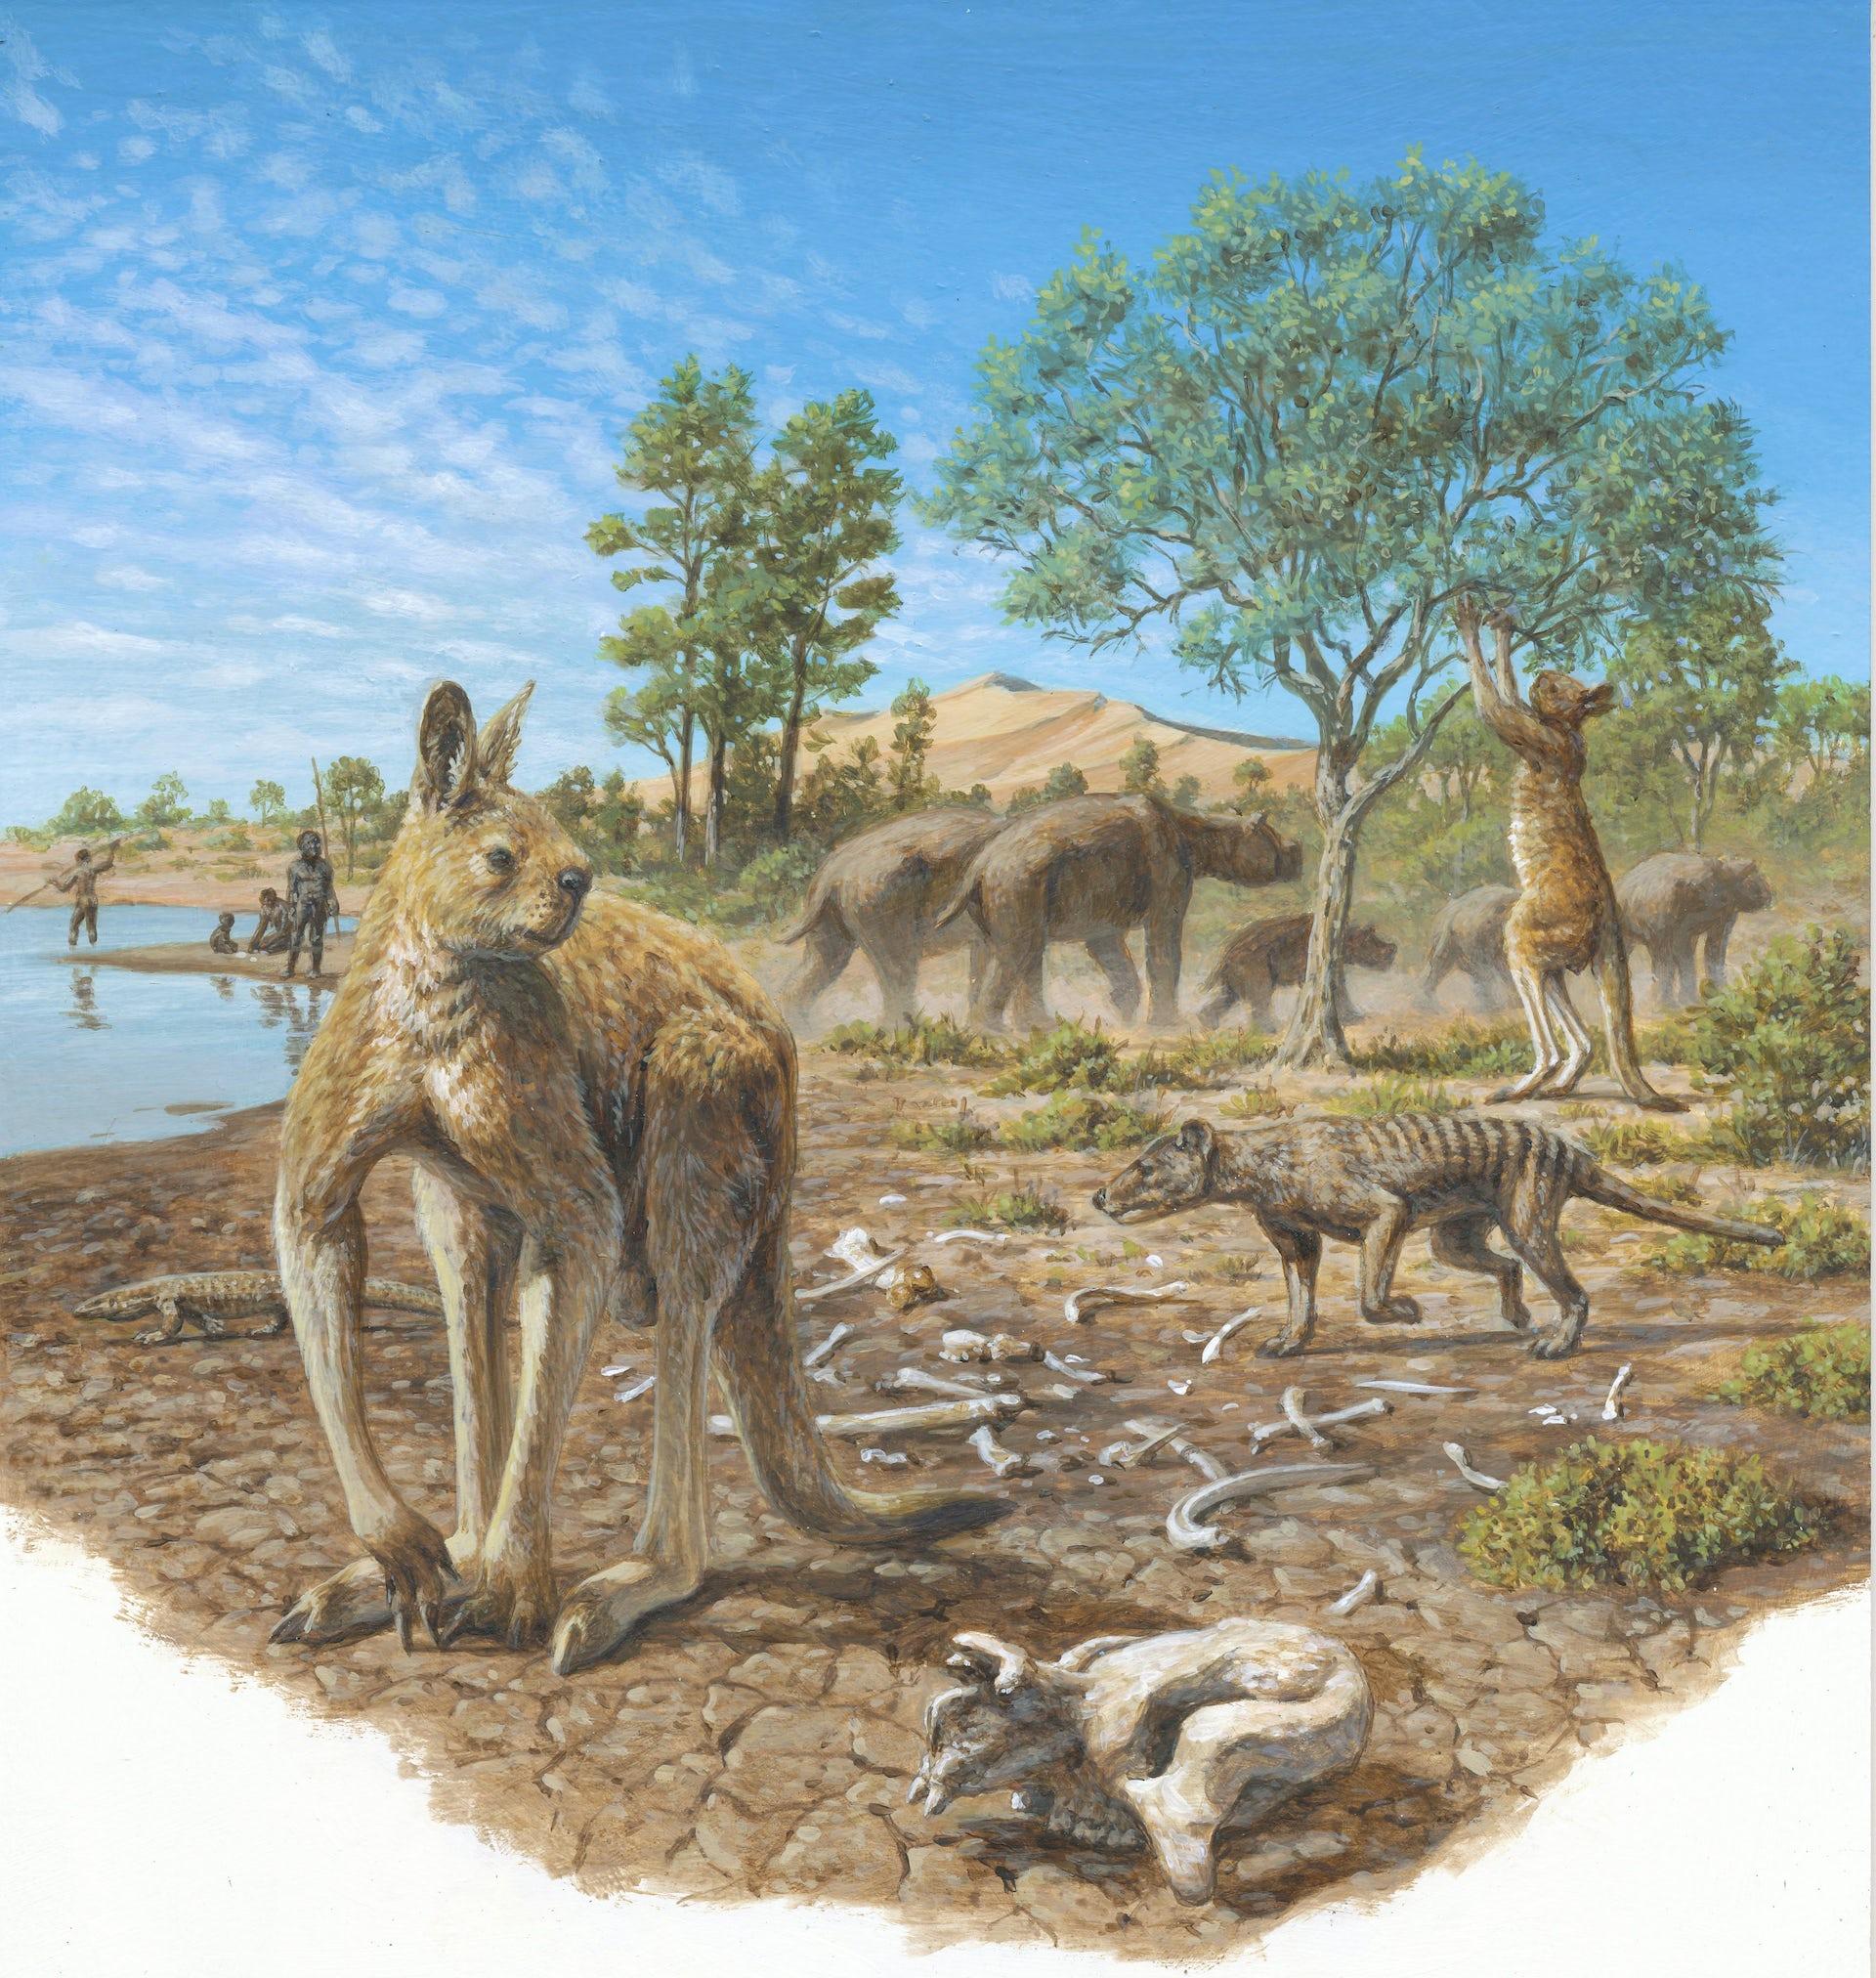 6000 years ago human civilization